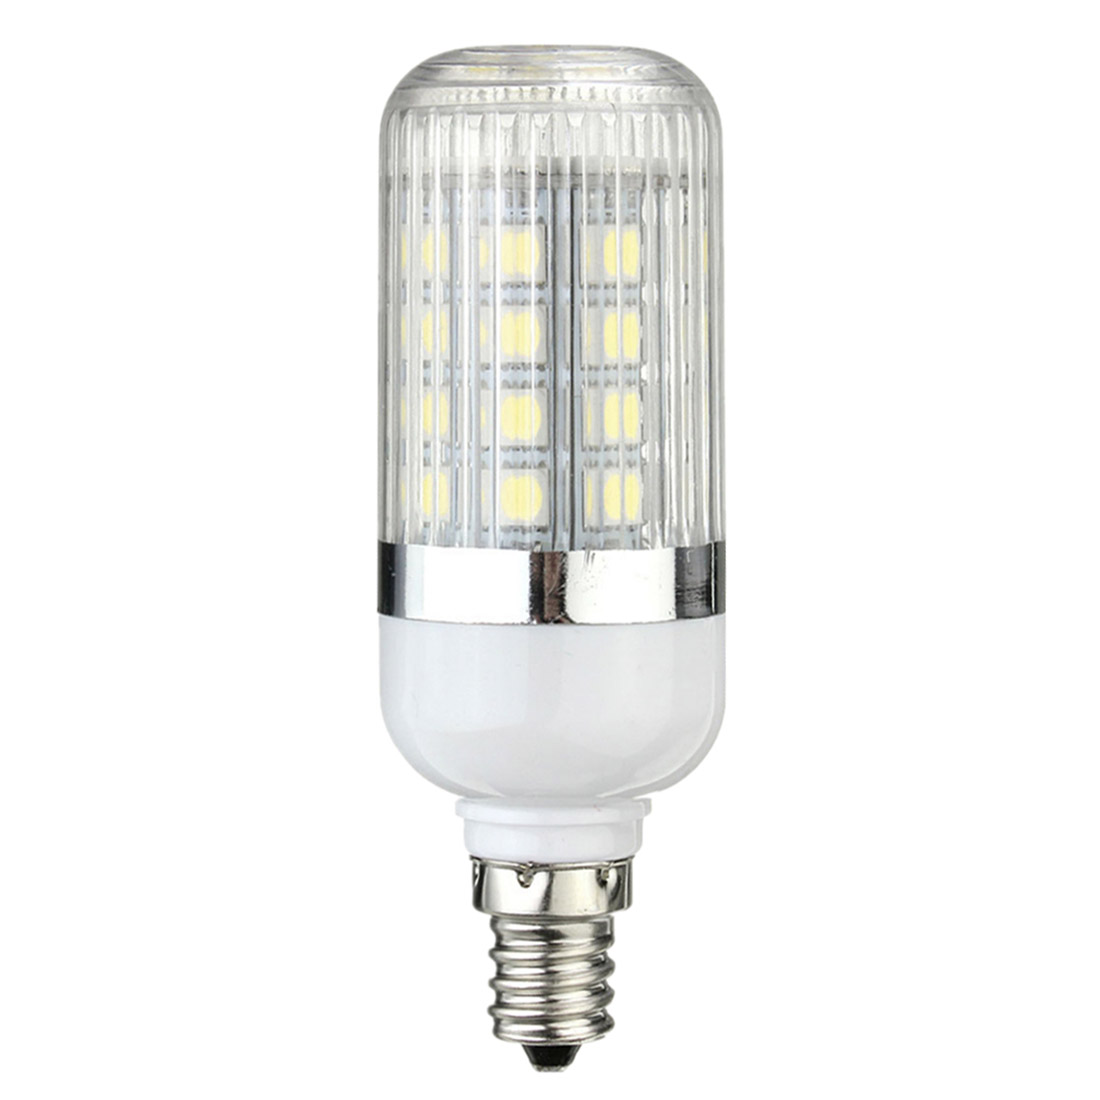 Sodial E12 5w Non Dimmable 36 Smd 5050 Led Corn Light Bulb